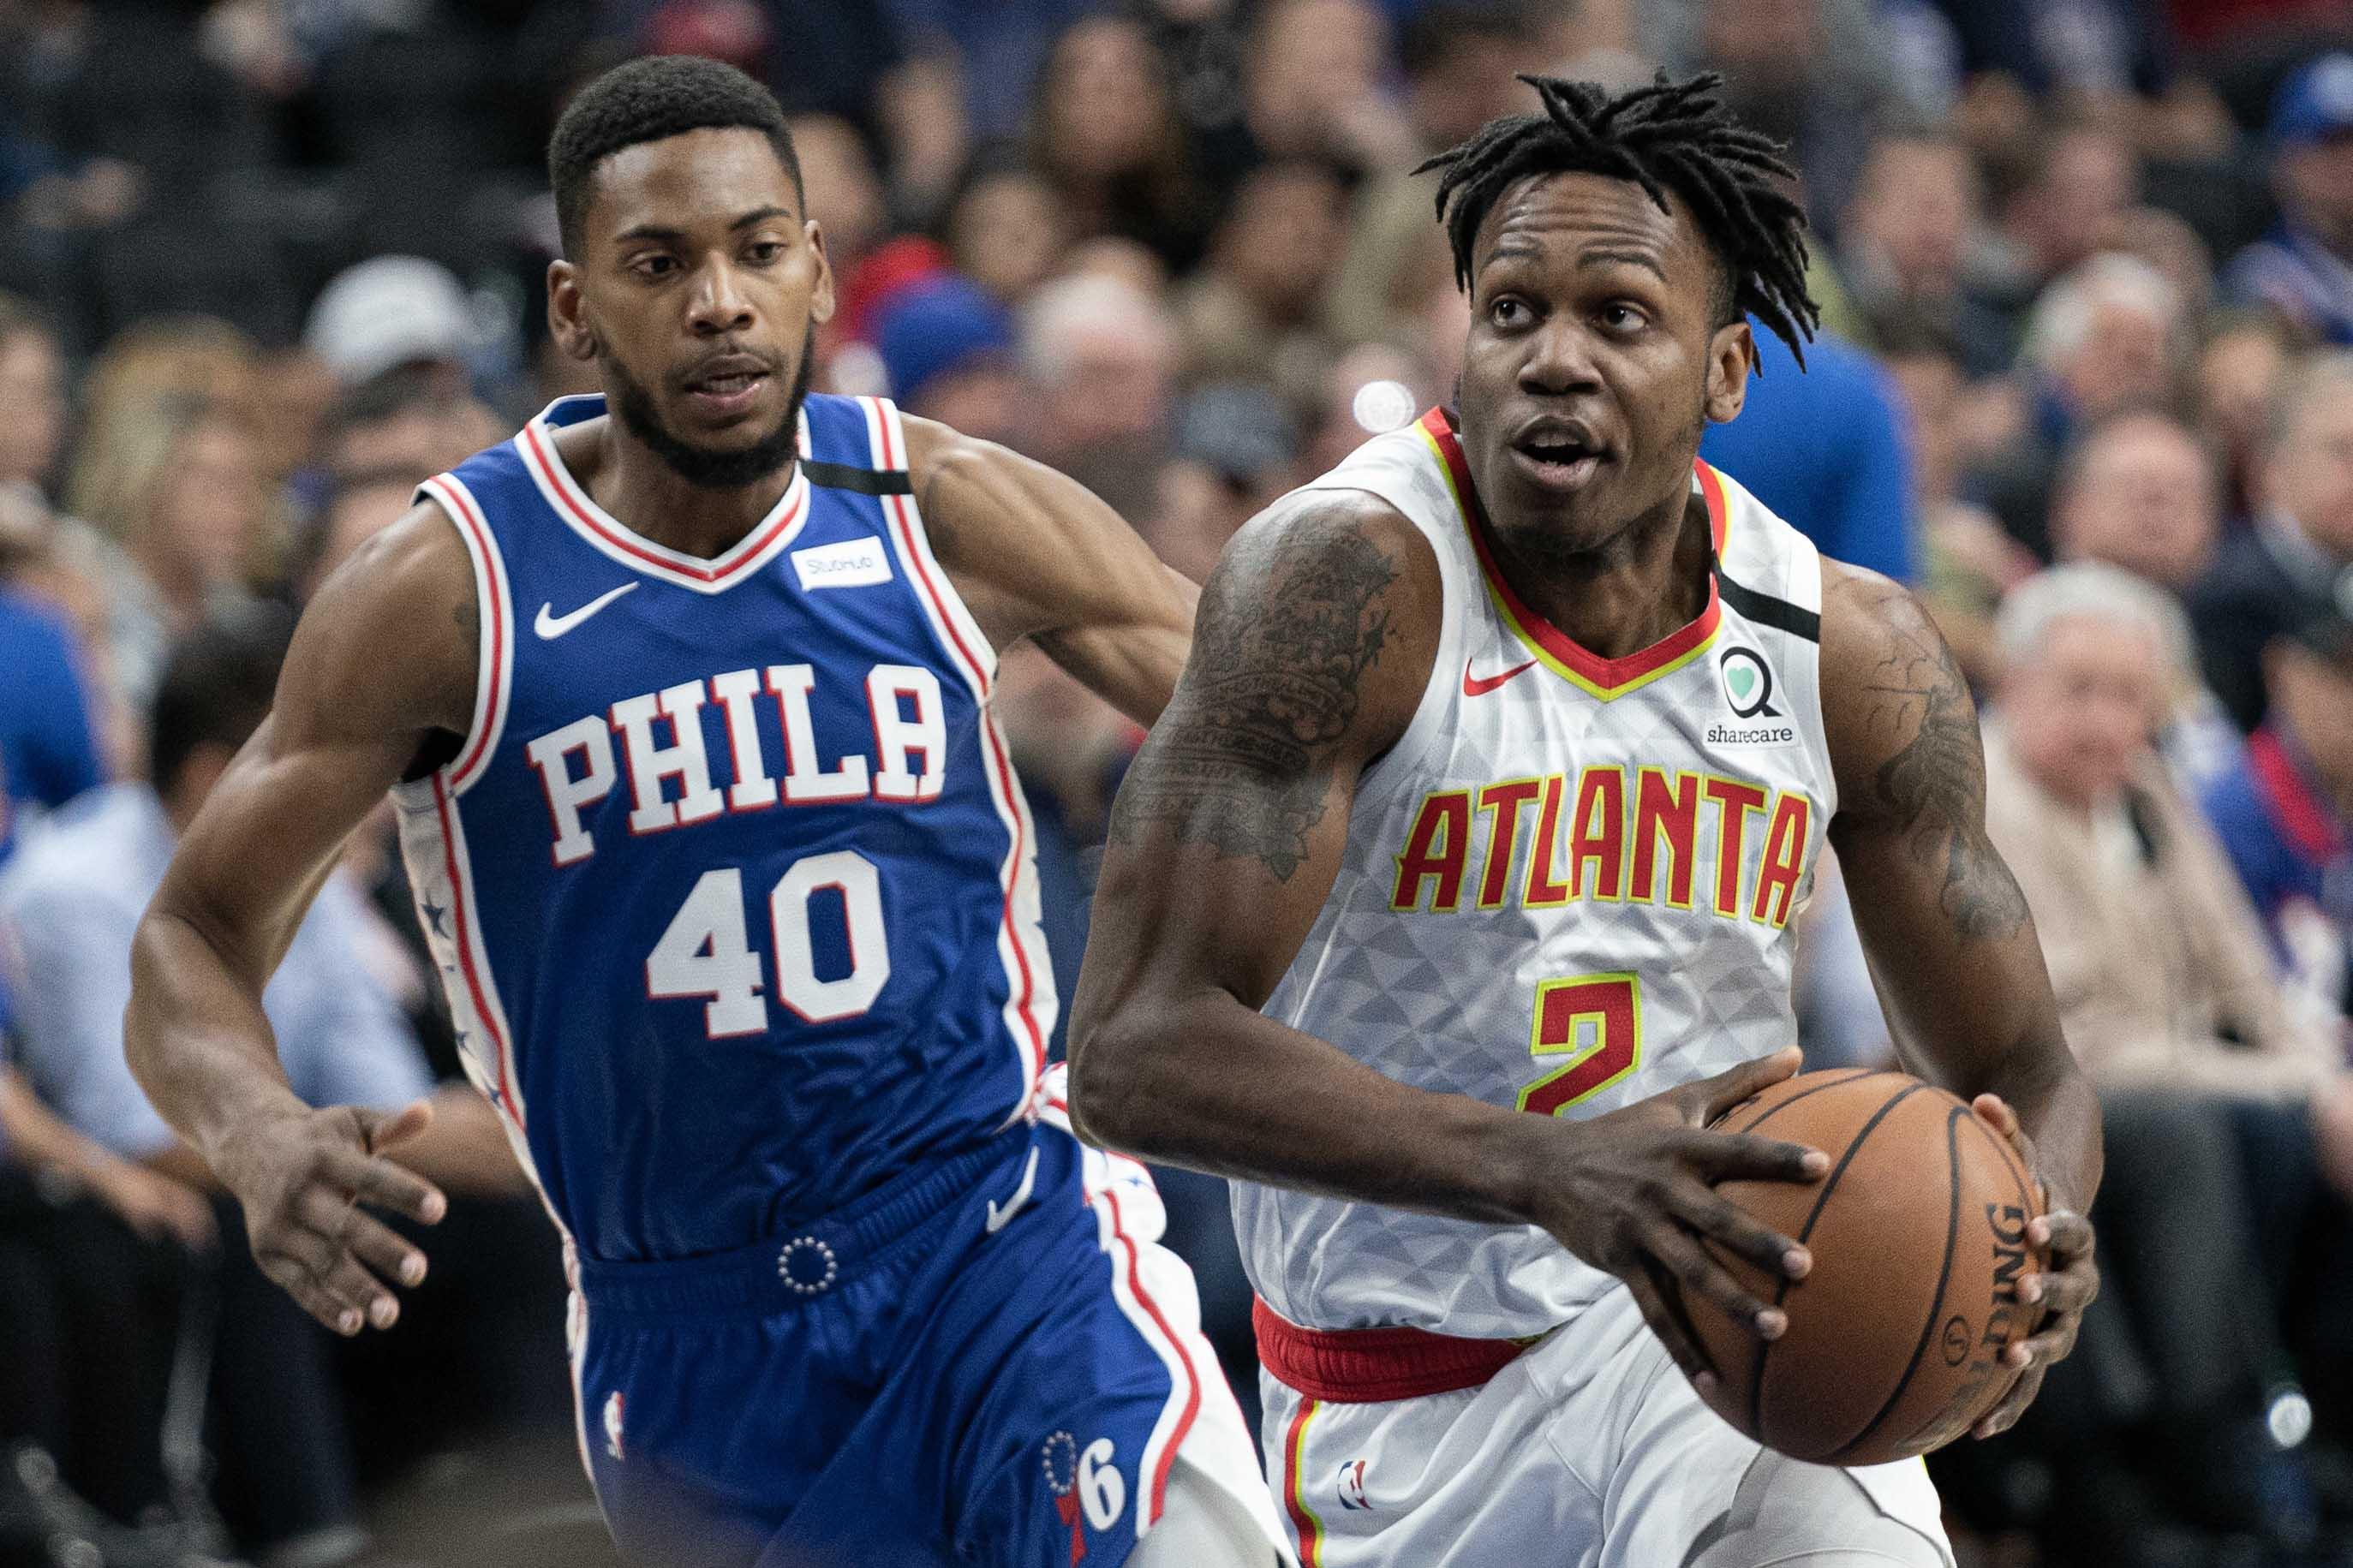 Feb 24, 2020; Philadelphia, Pennsylvania, USA; Atlanta Hawks guard Treveon Graham (2) drives against Philadelphia 76ers forward Glenn Robinson III (40) during the first quarter at Wells Fargo Center.